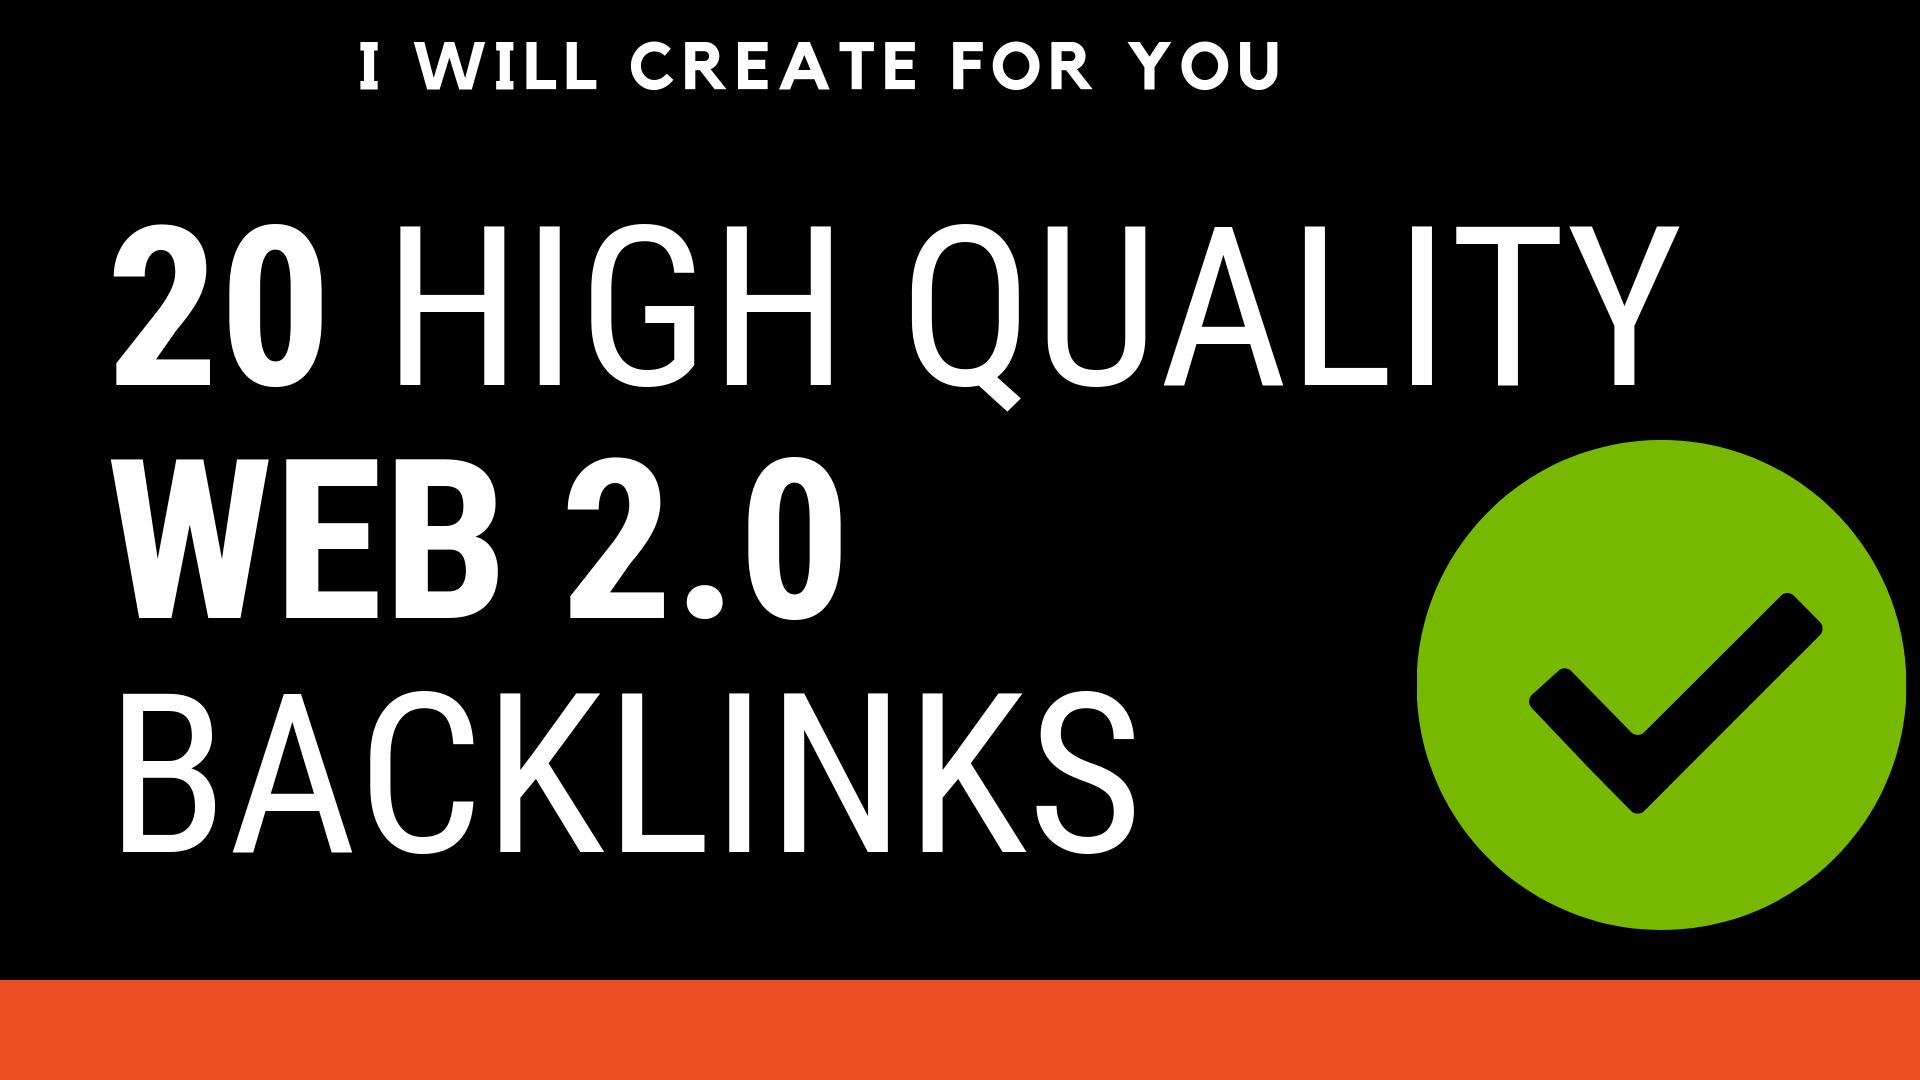 i will create 20 high quality web 2.0 backlinks